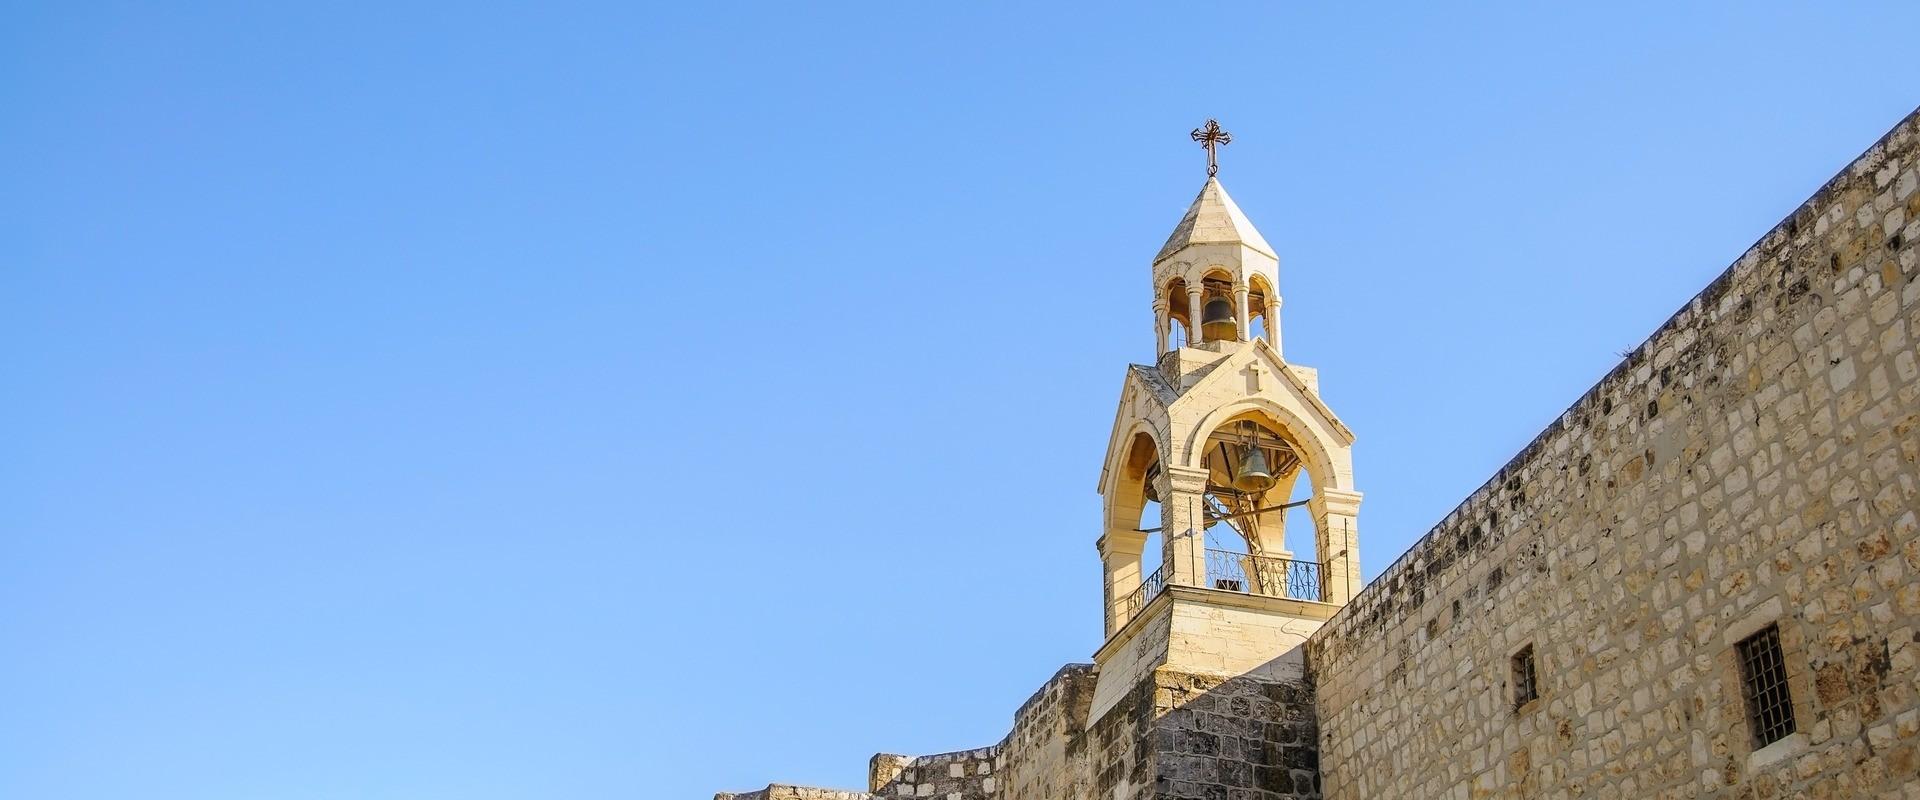 Bethlehem Tour | Private tour in Bethlehem | Holy Land VIP Tours